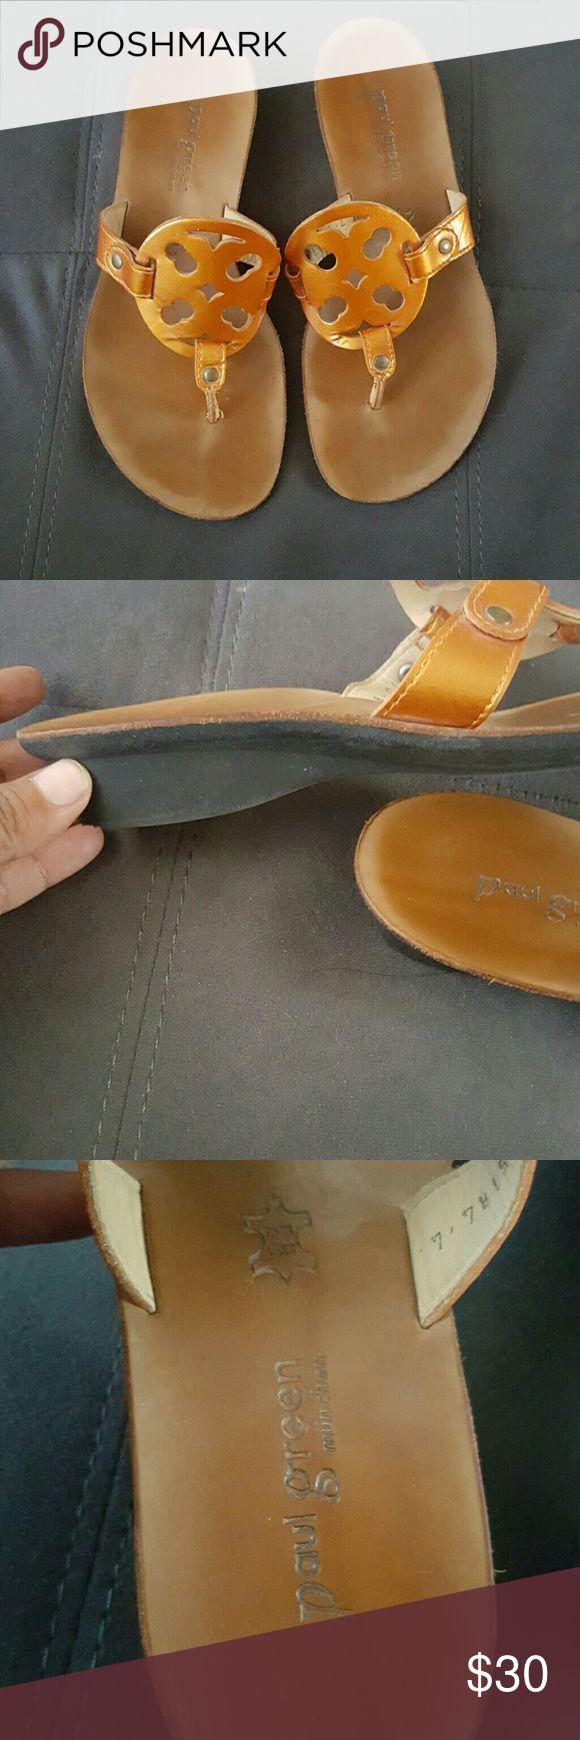 Paul Green Sandals Size 7 Excellent Condition...Orange brownish Color...Super Cute!!! Paul Green Shoes Sandals